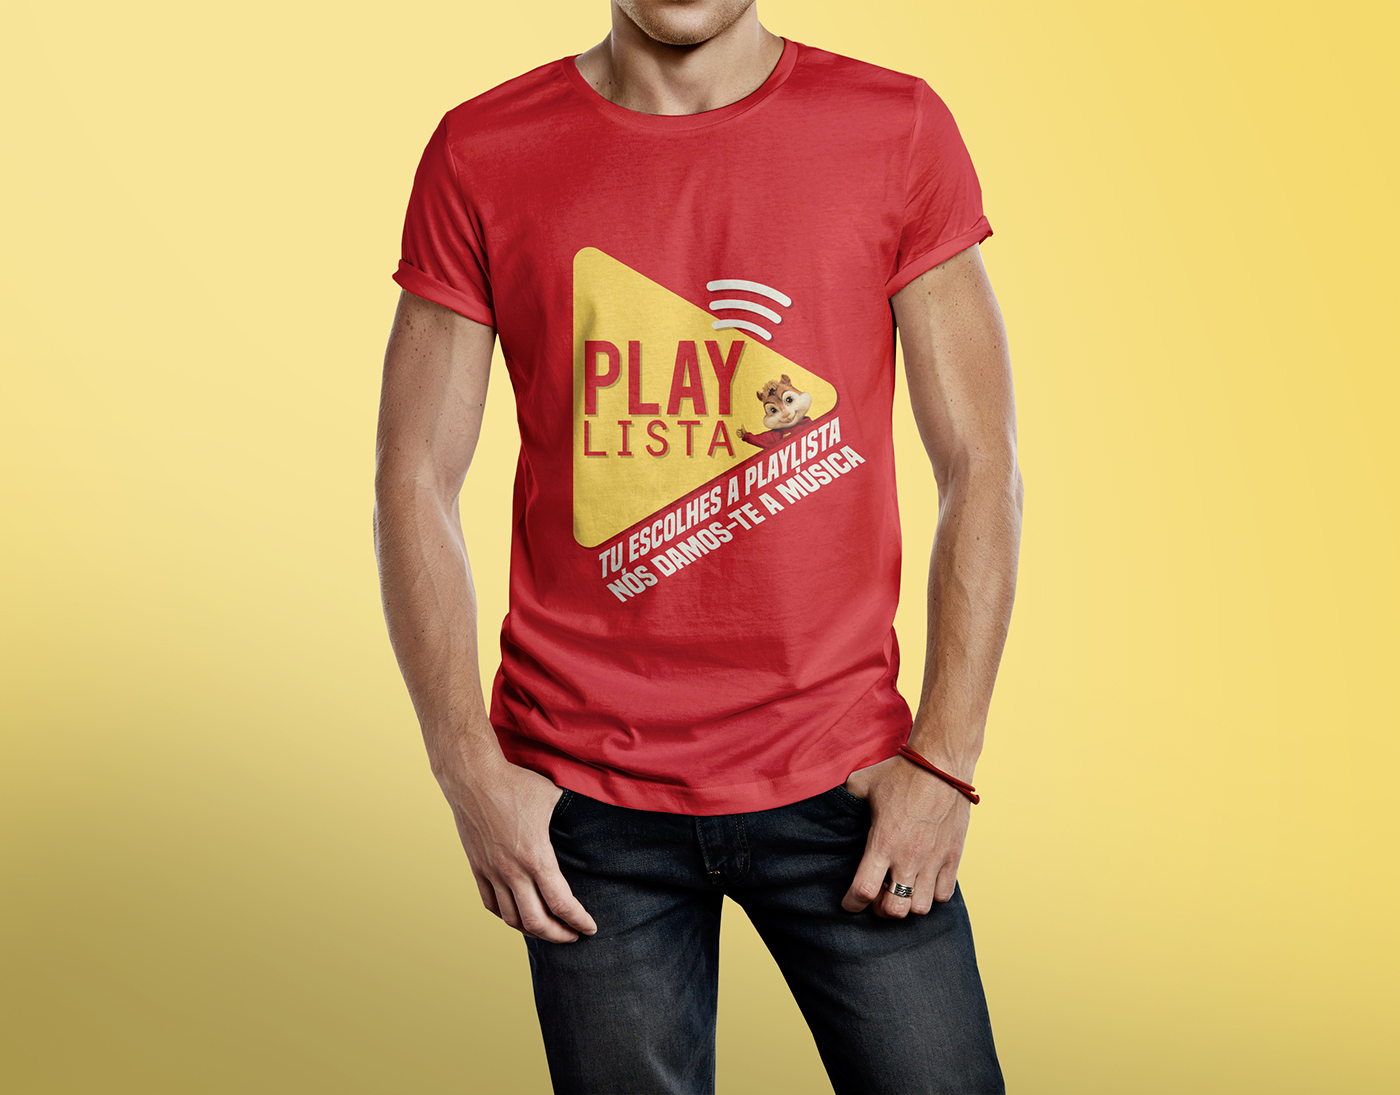 lista play INA playlista logo alvin